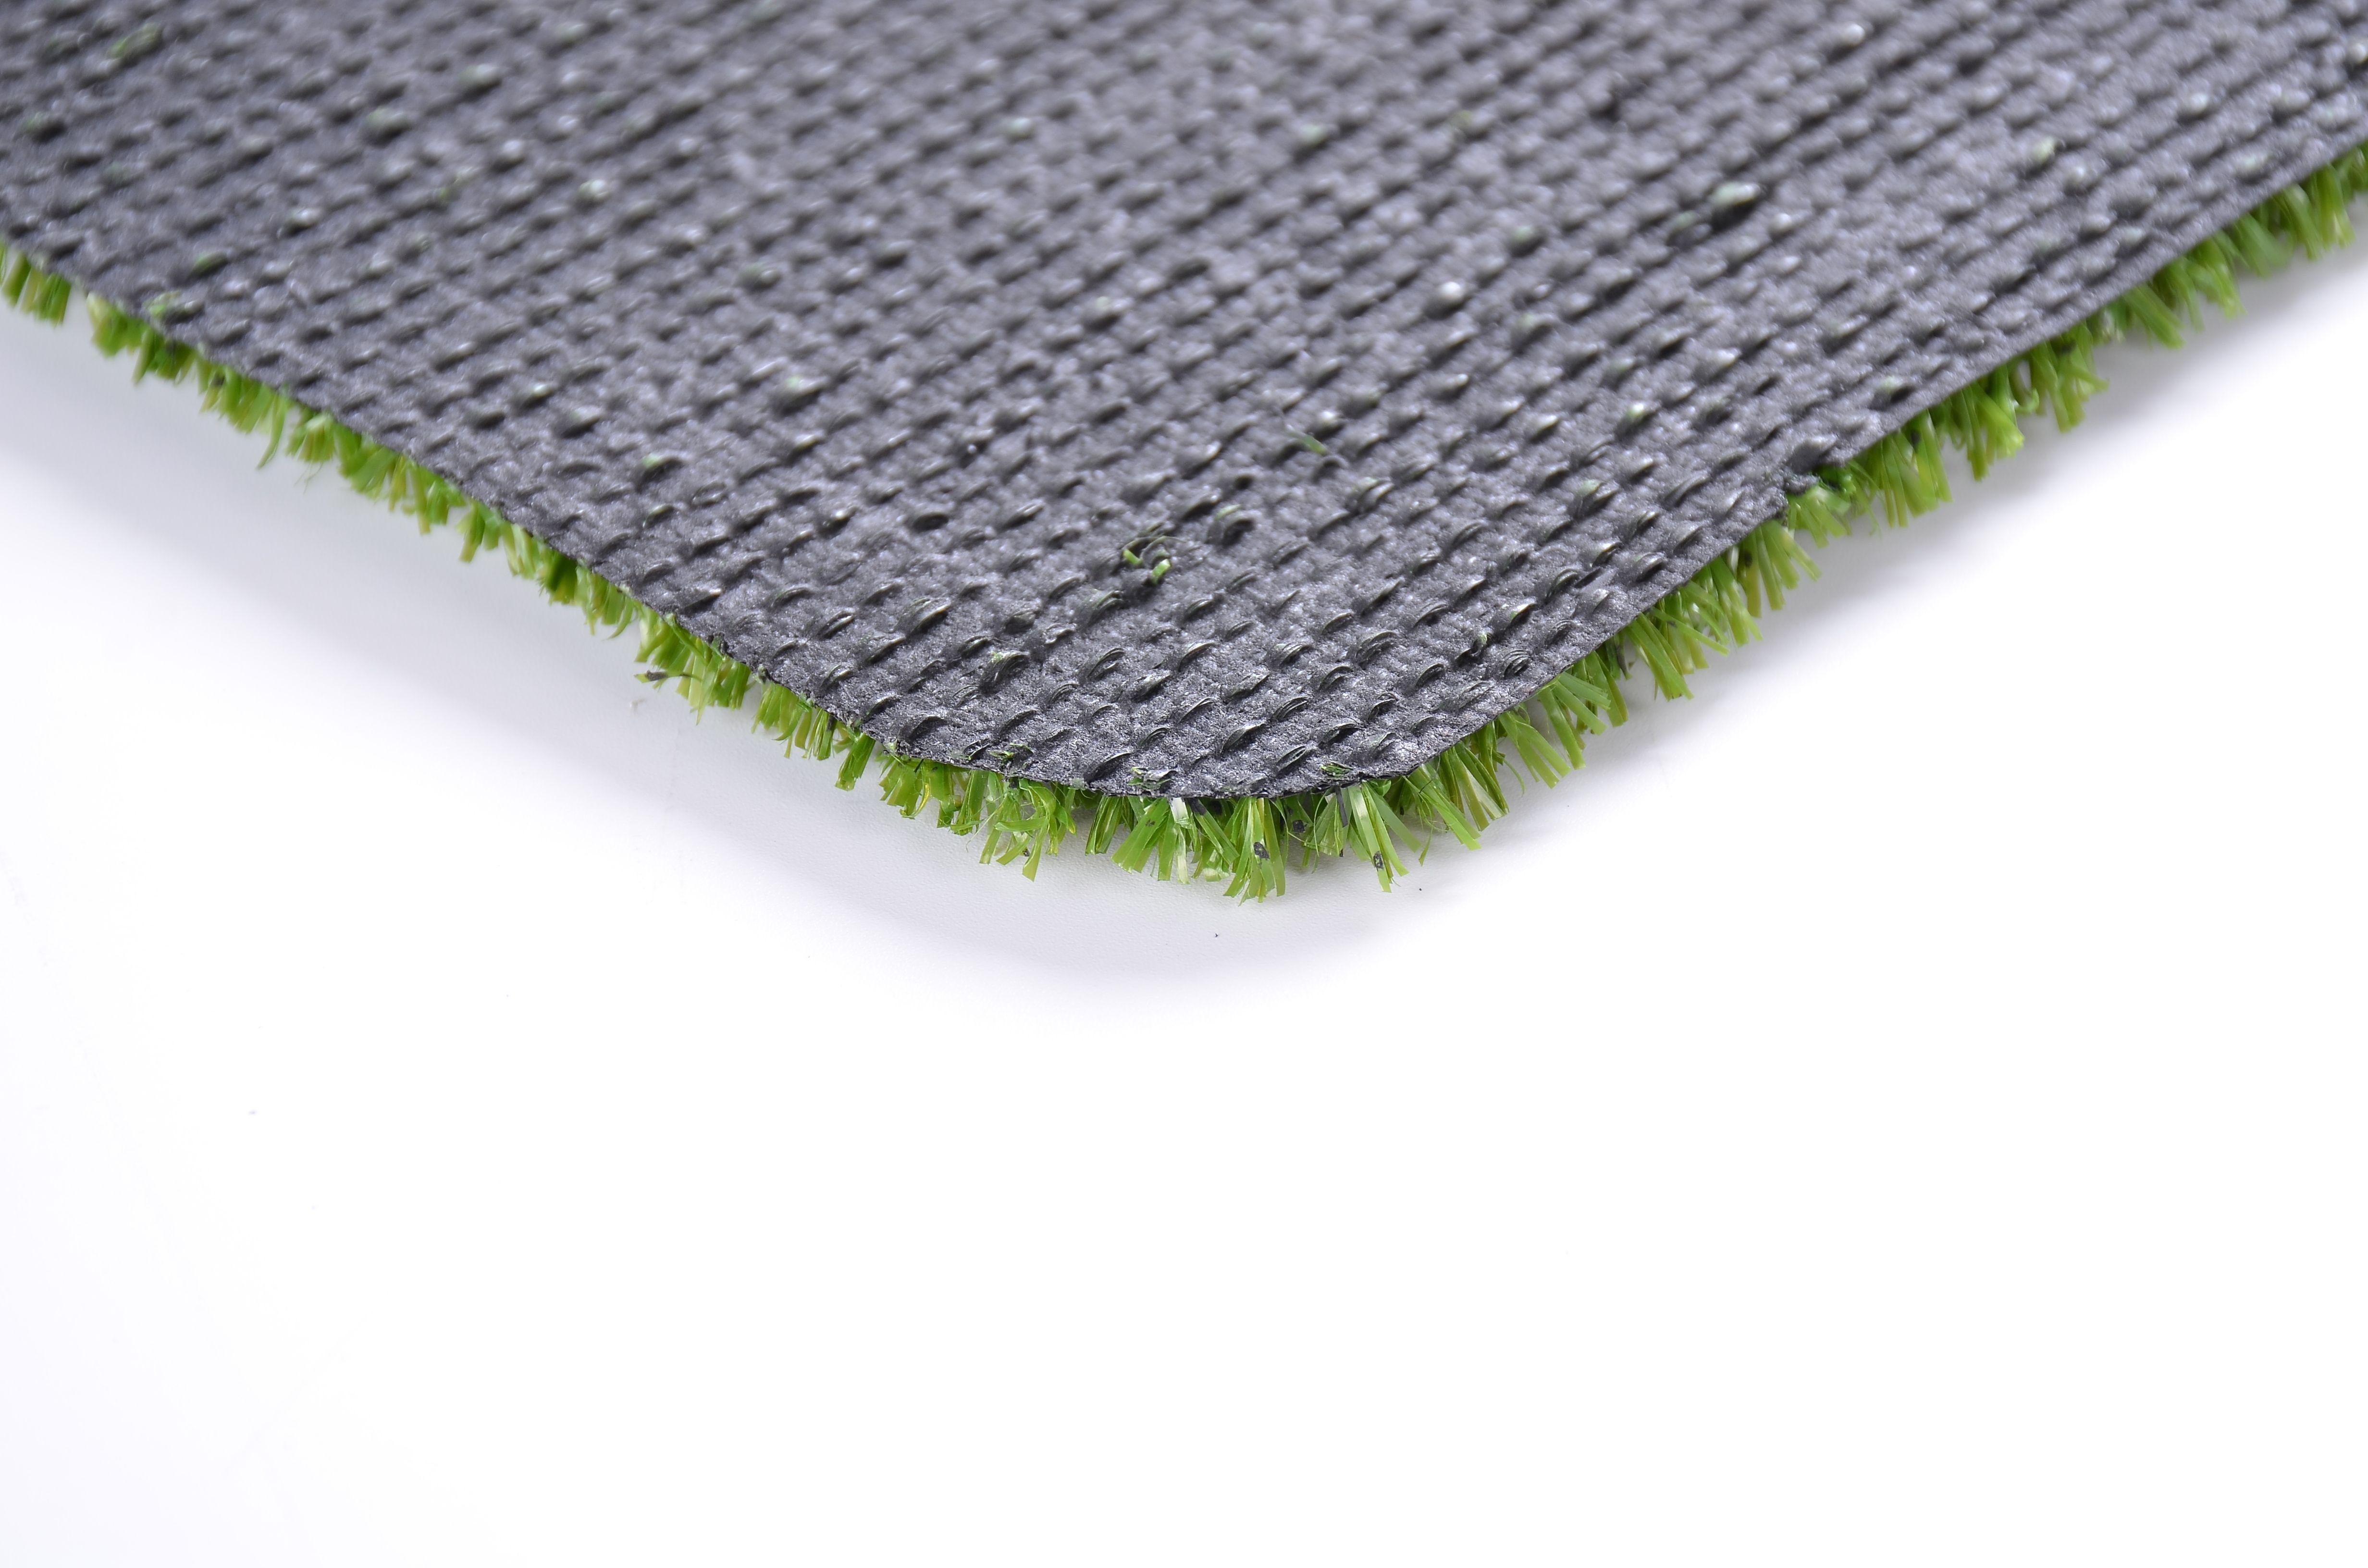 Commercial green grass